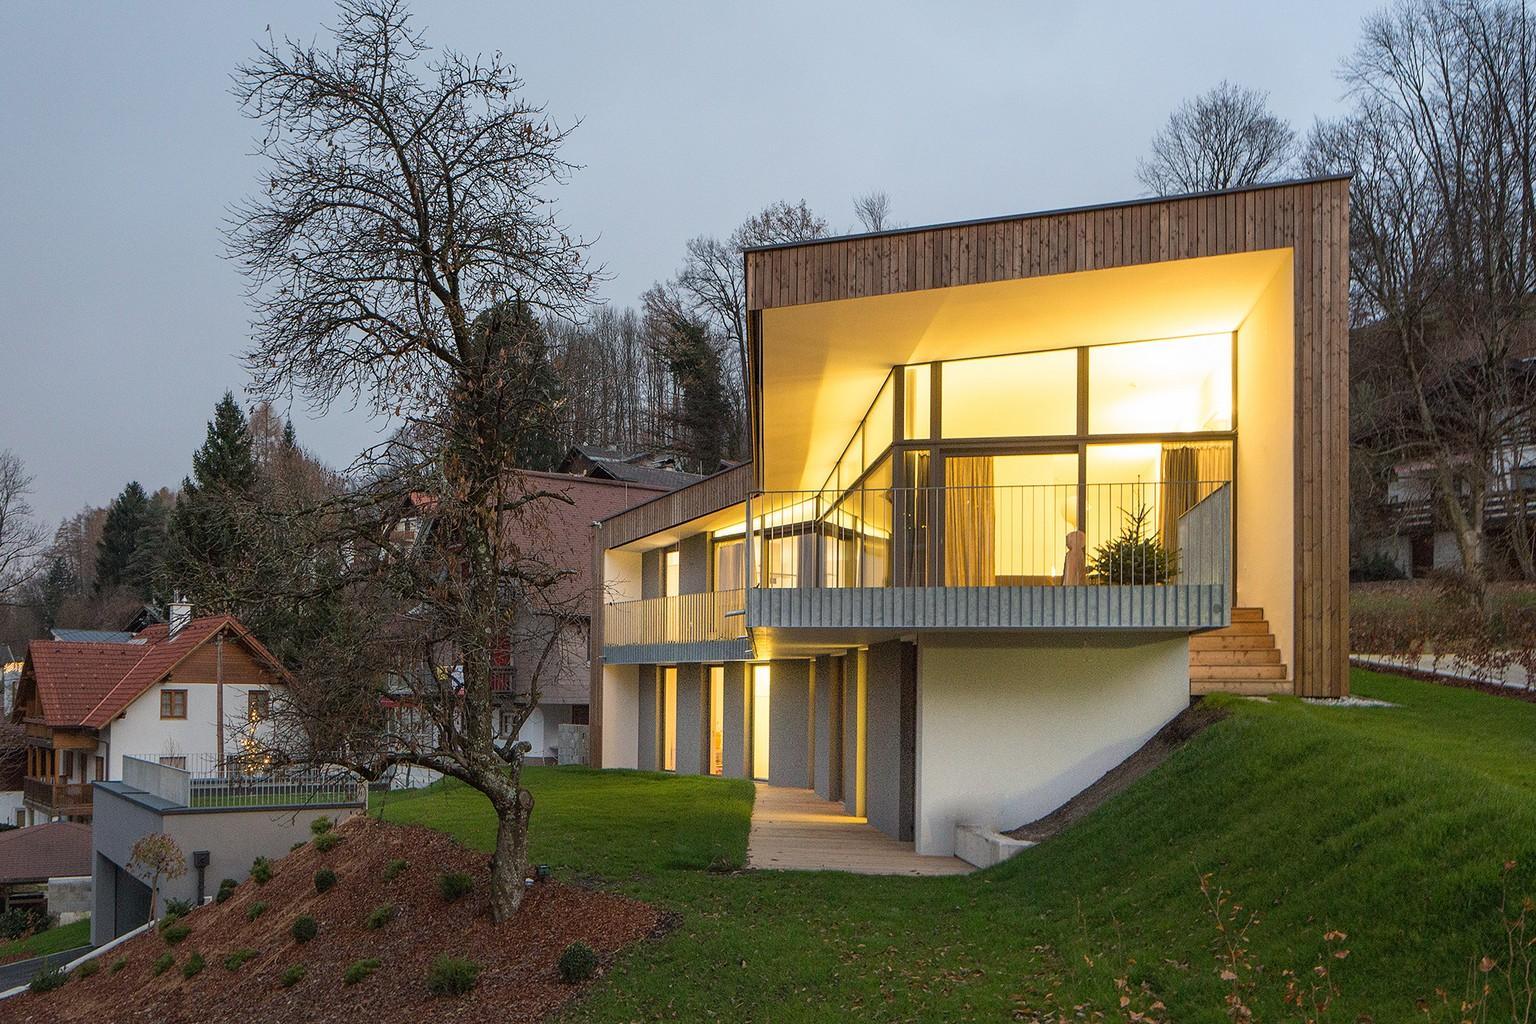 Ravna parcela ali parcela na hribu for Site design architecture